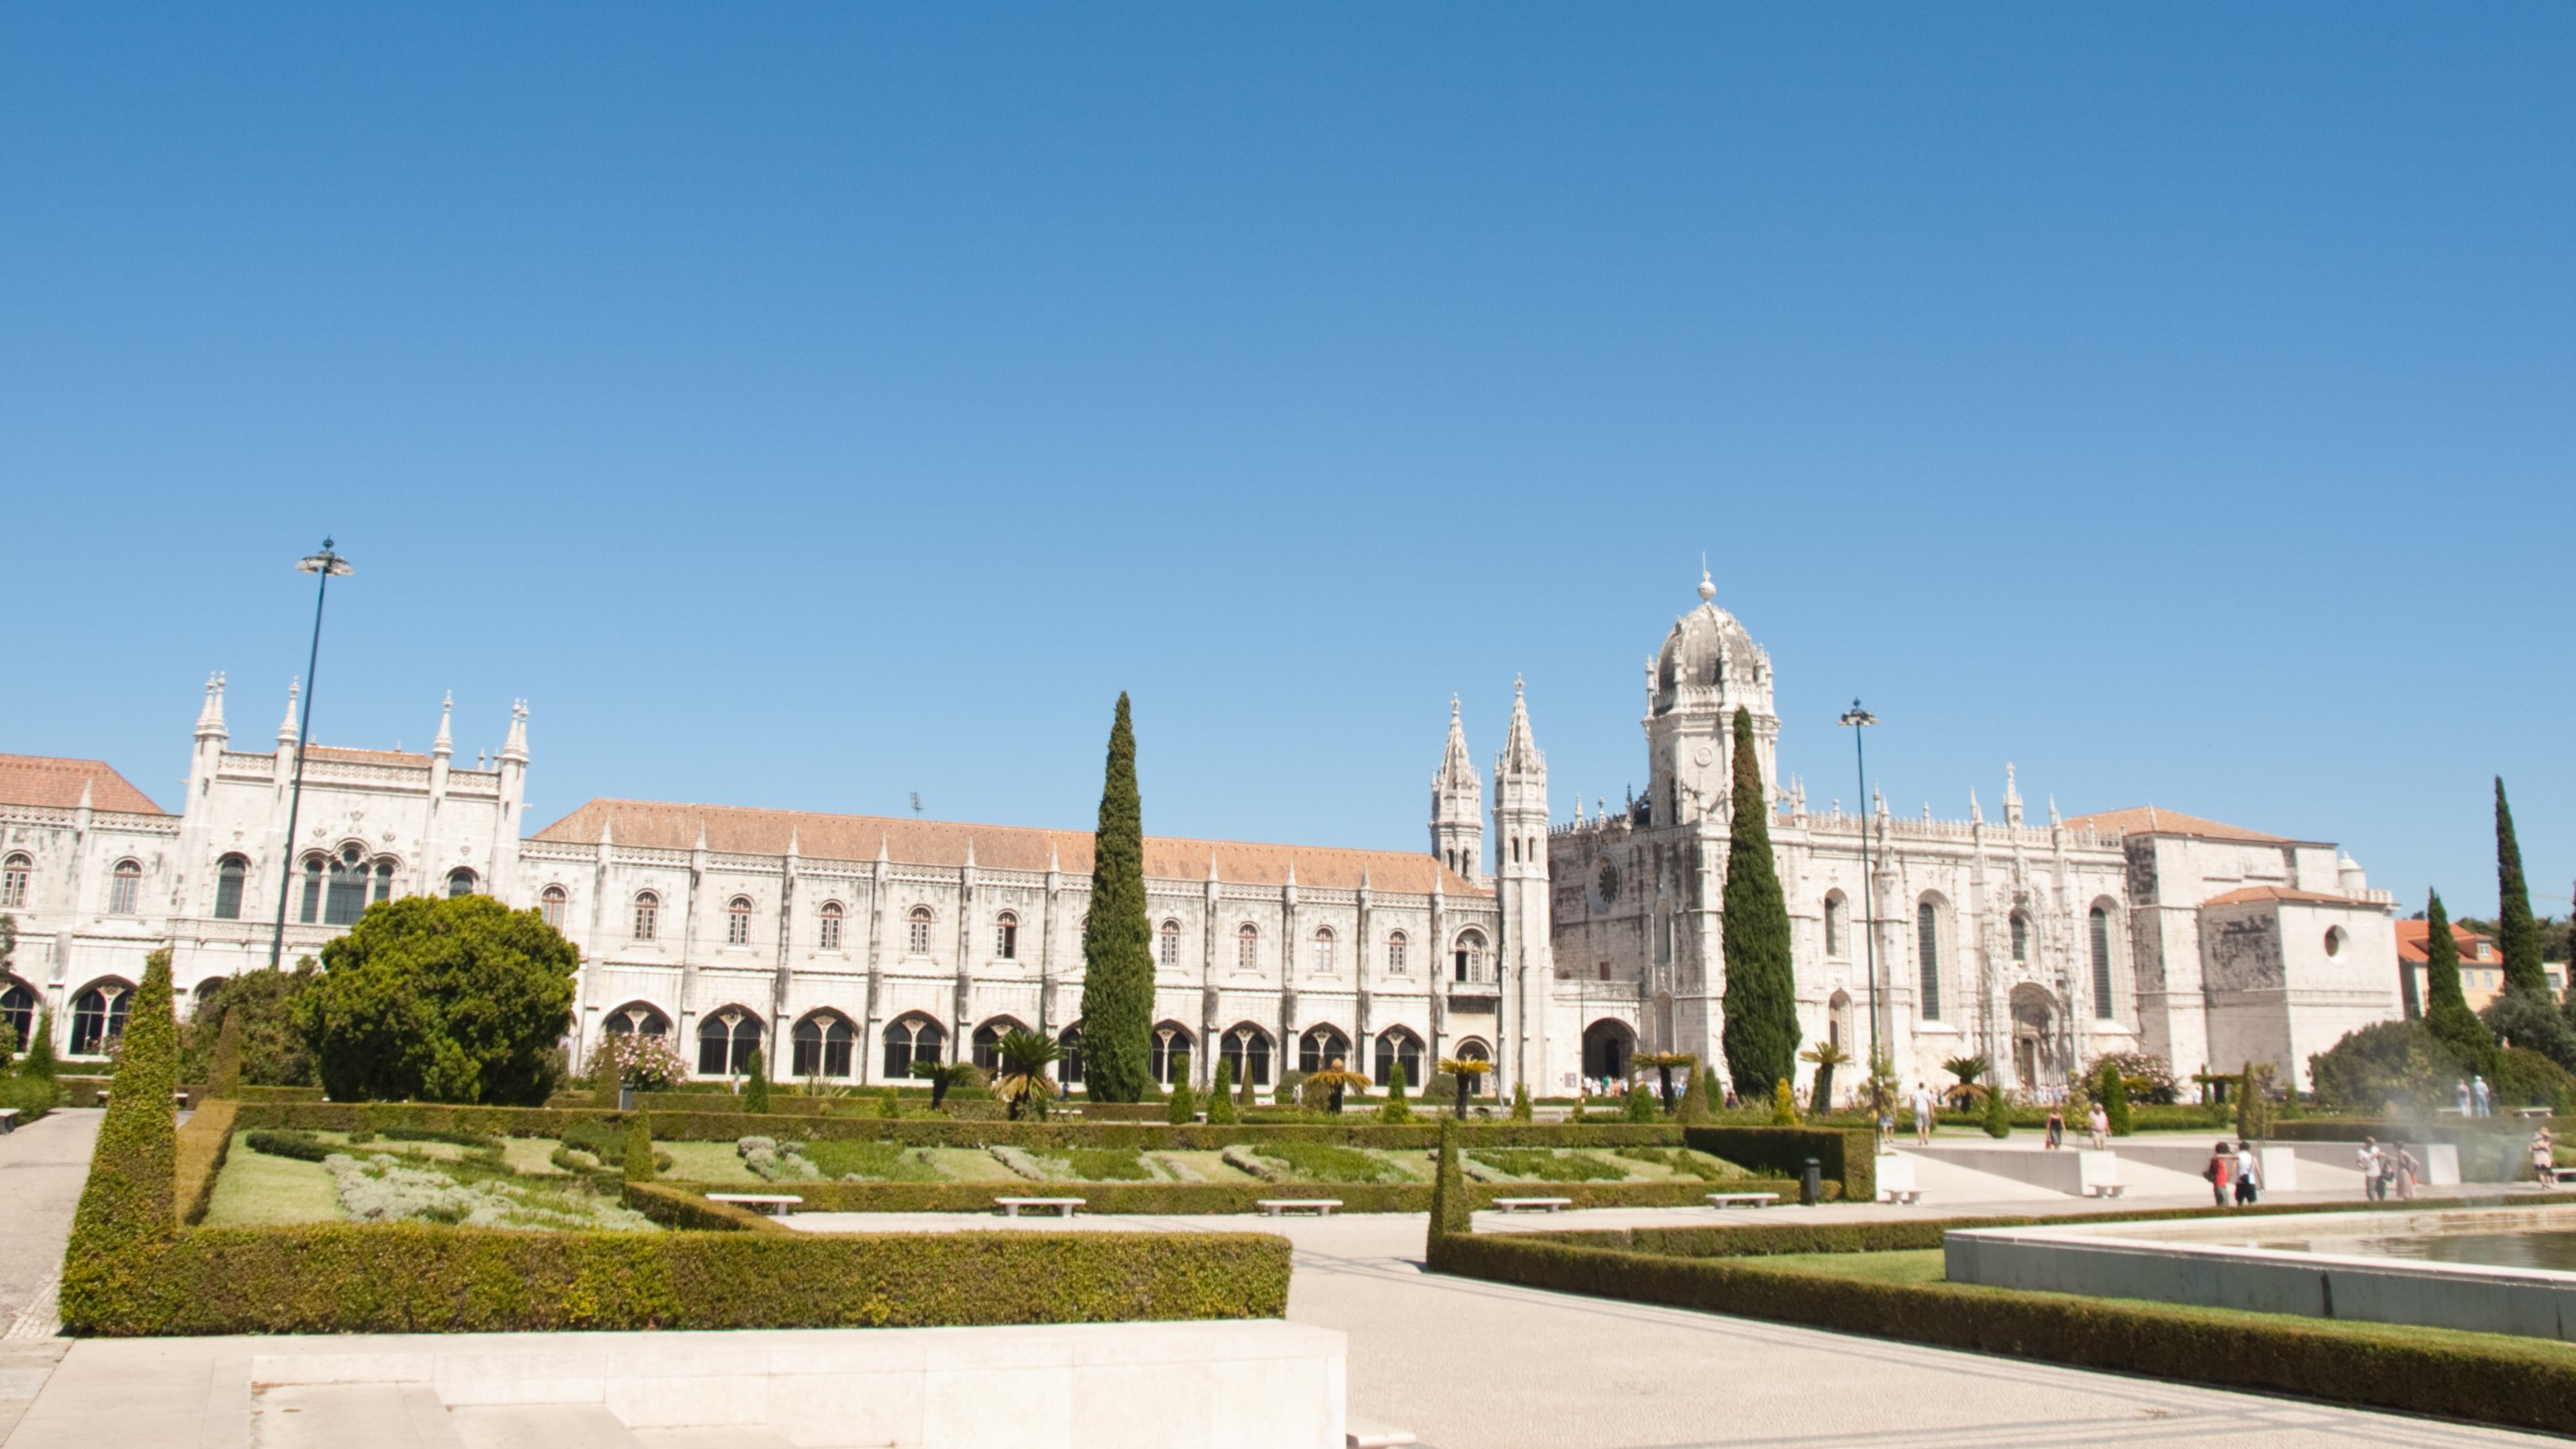 The Hieronymites Monastery of Lisbon